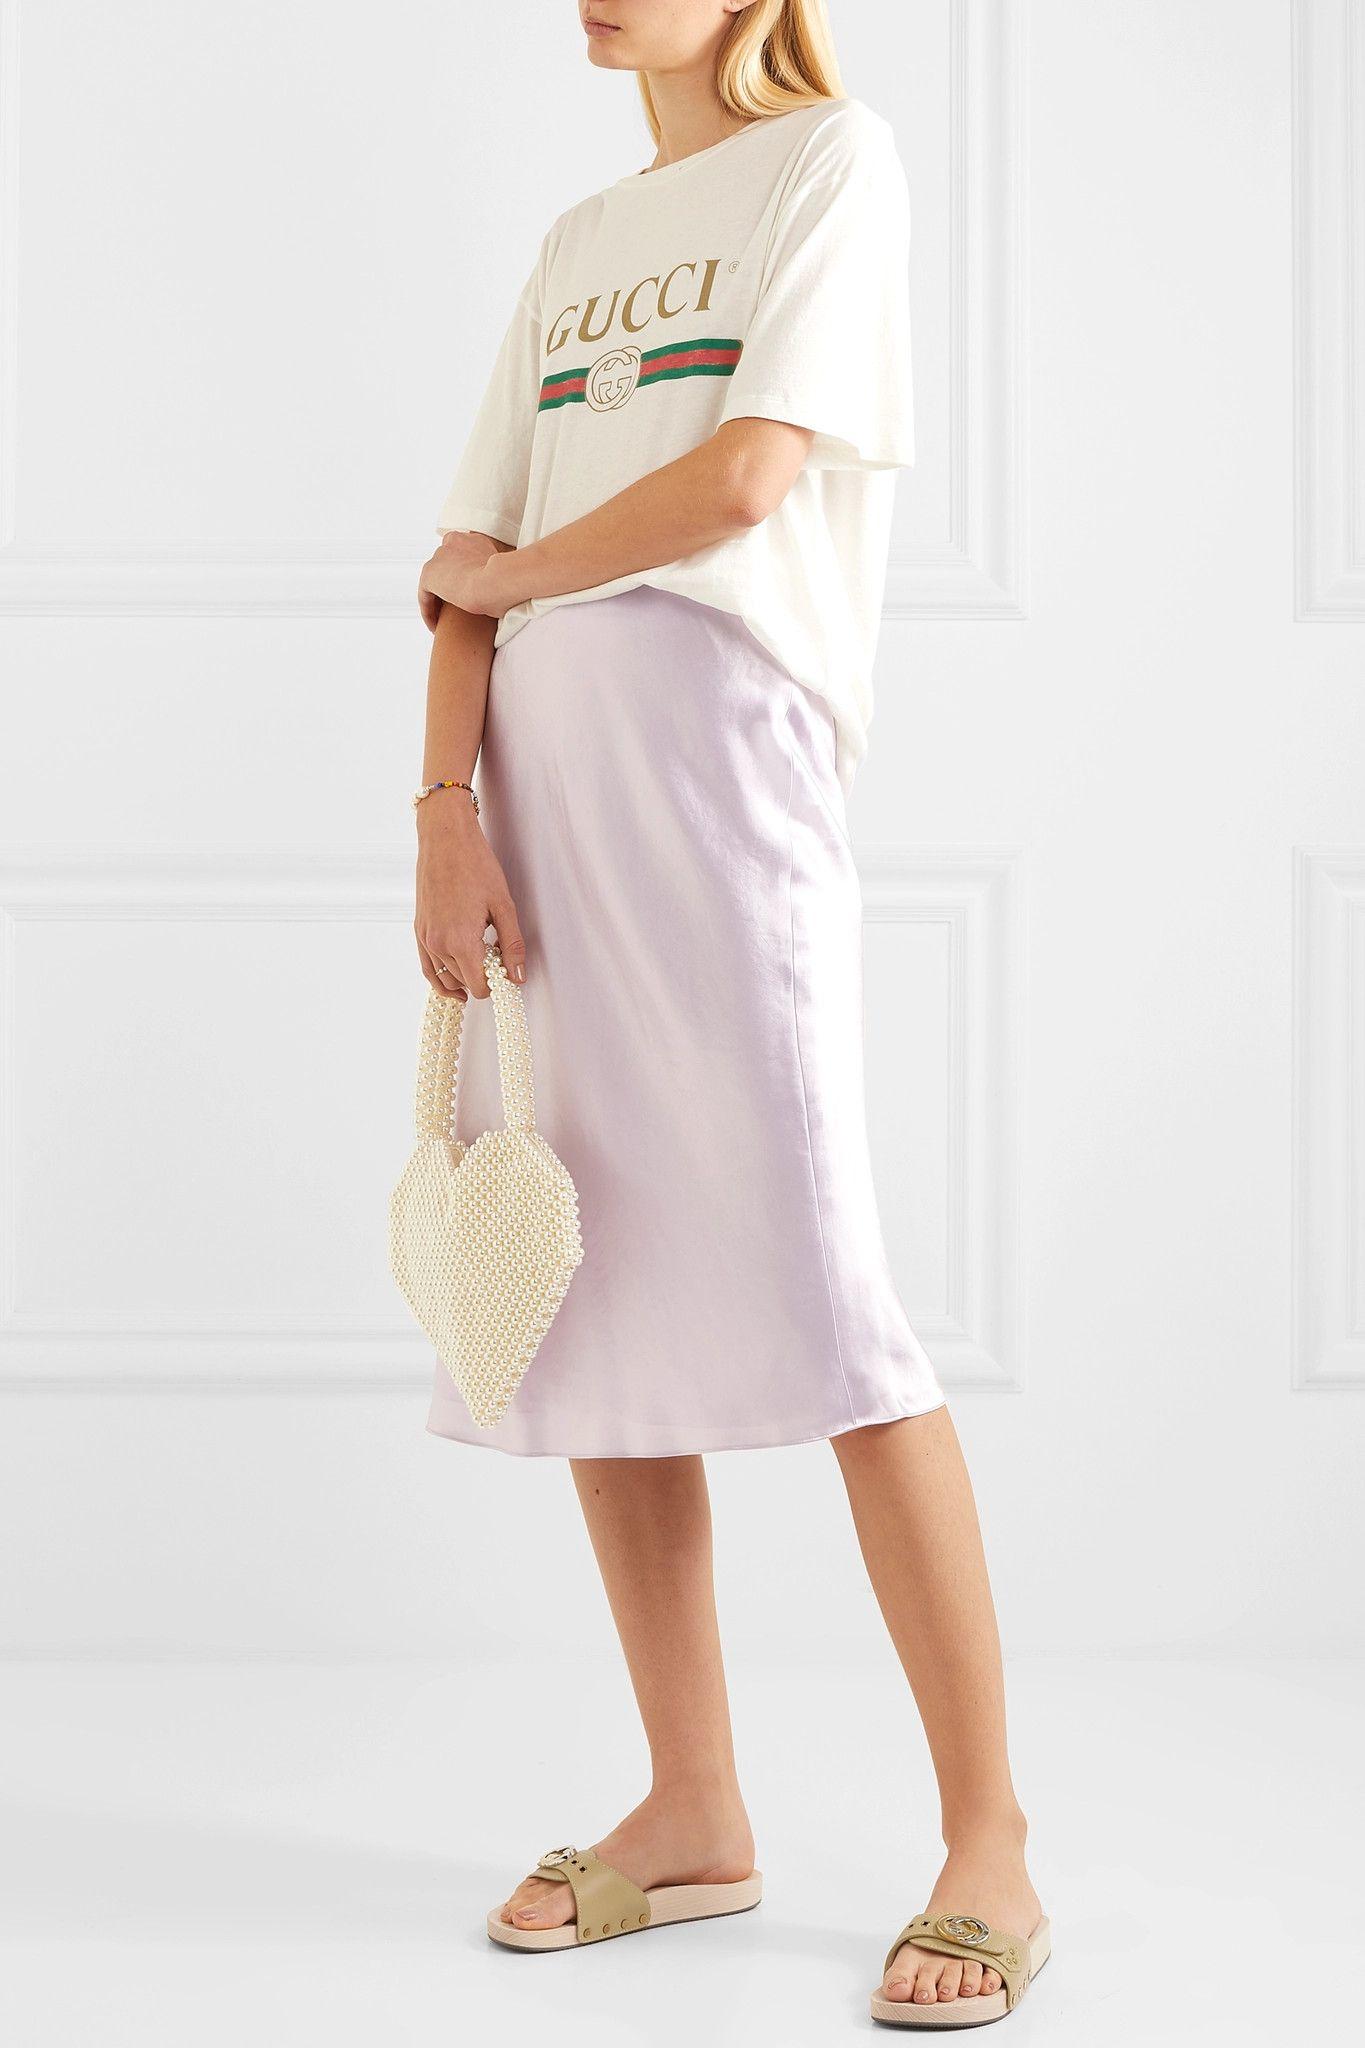 Zoccoli Moda 2020: 10 revival dei sandali anni Sessanta